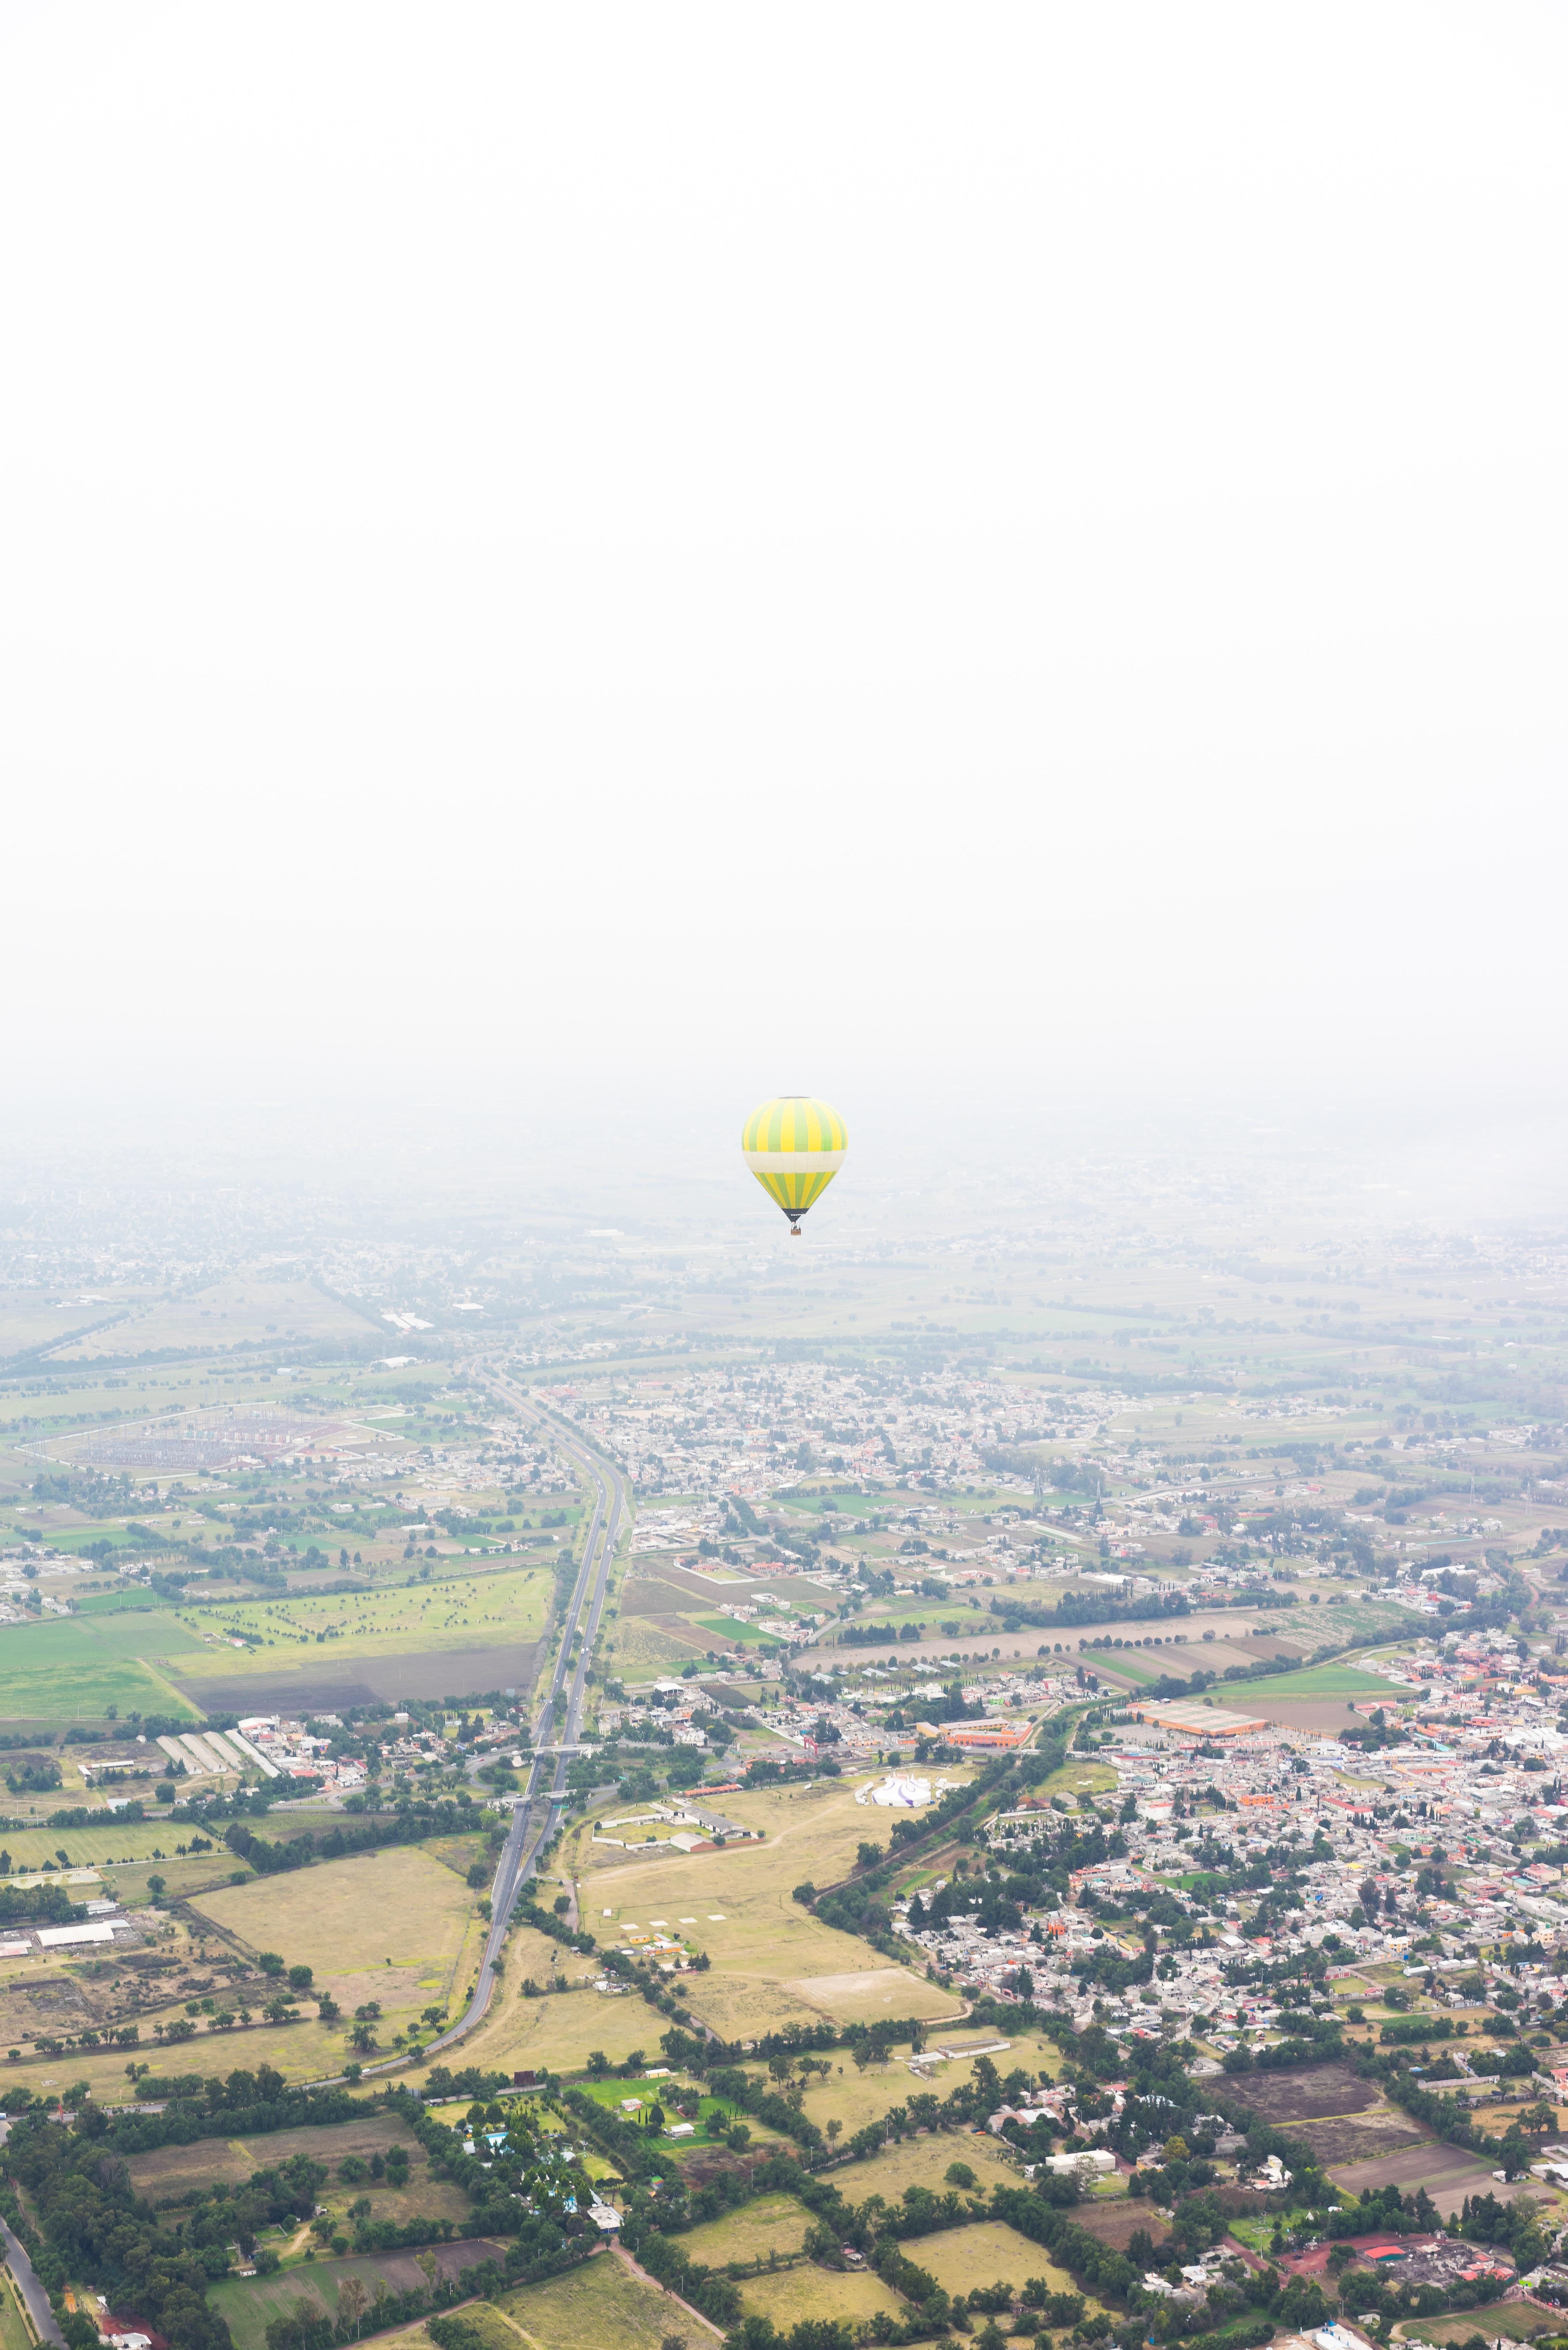 Gambar Fotografi Balon Udara Penerbangan Pesawat Terbang Kendaraan Olahraga Ekstrim